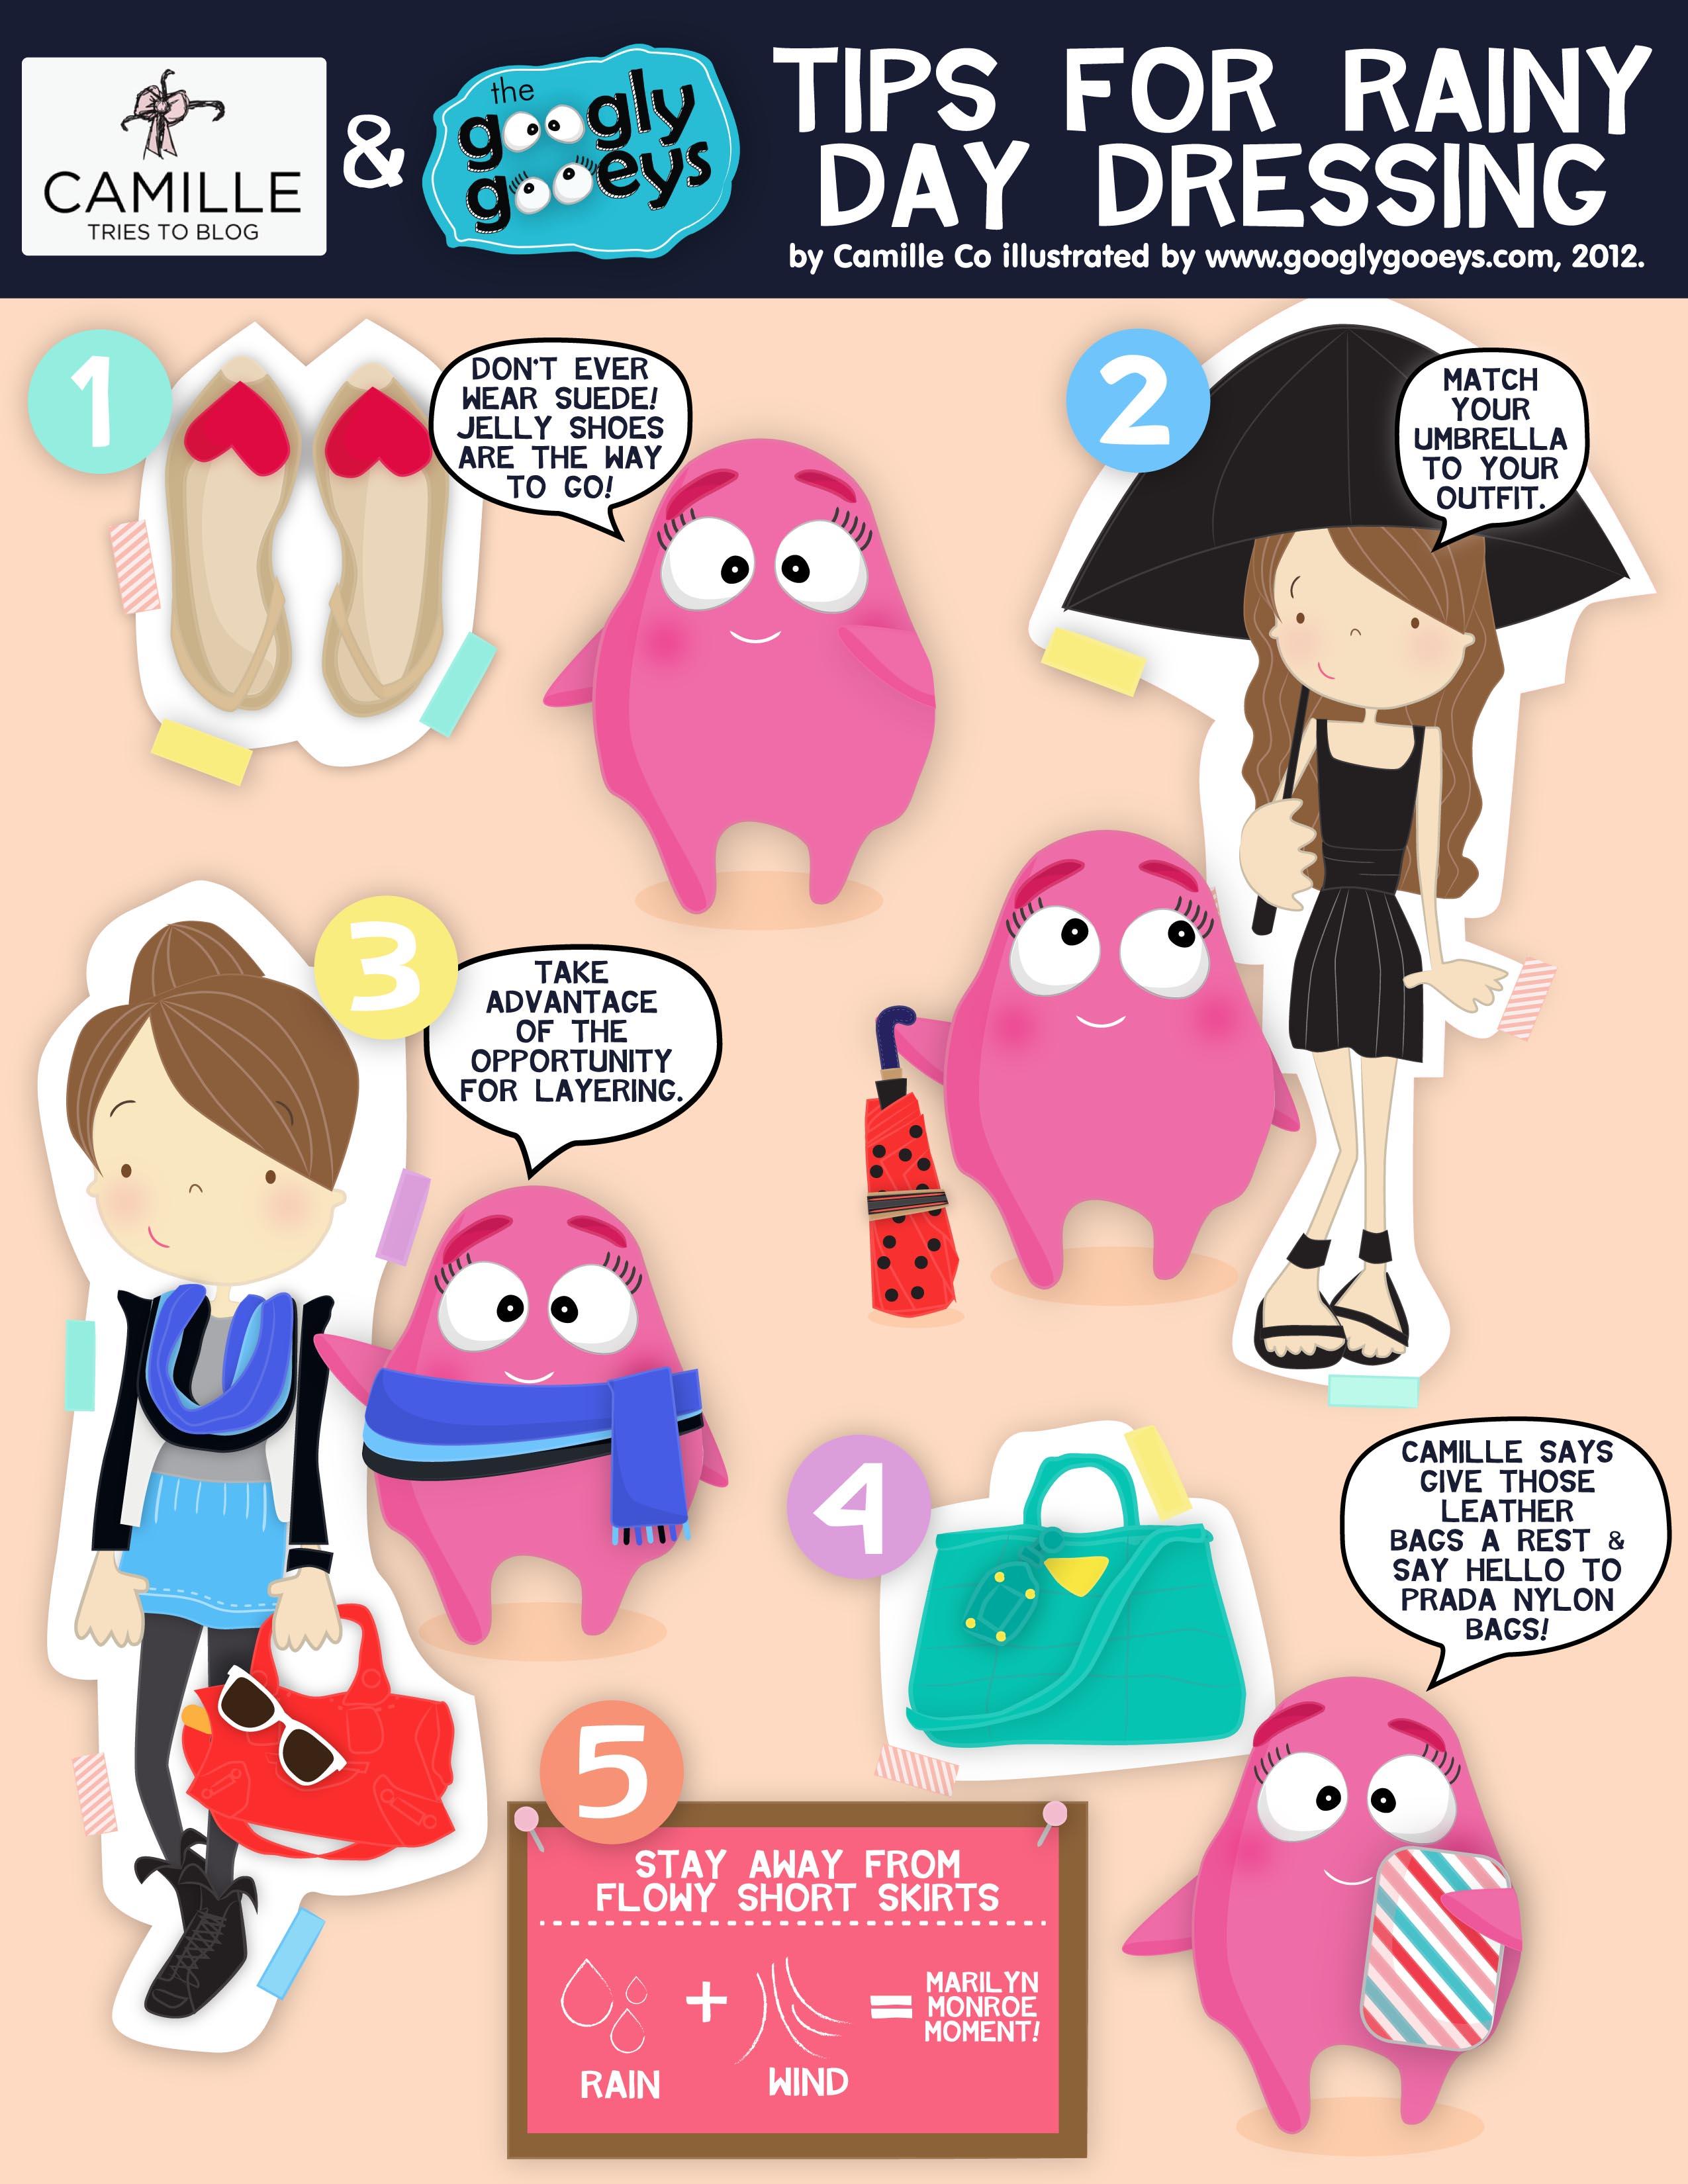 Camille Co + The Googly Gooeys: Rainy Day Dressing Tips! :)